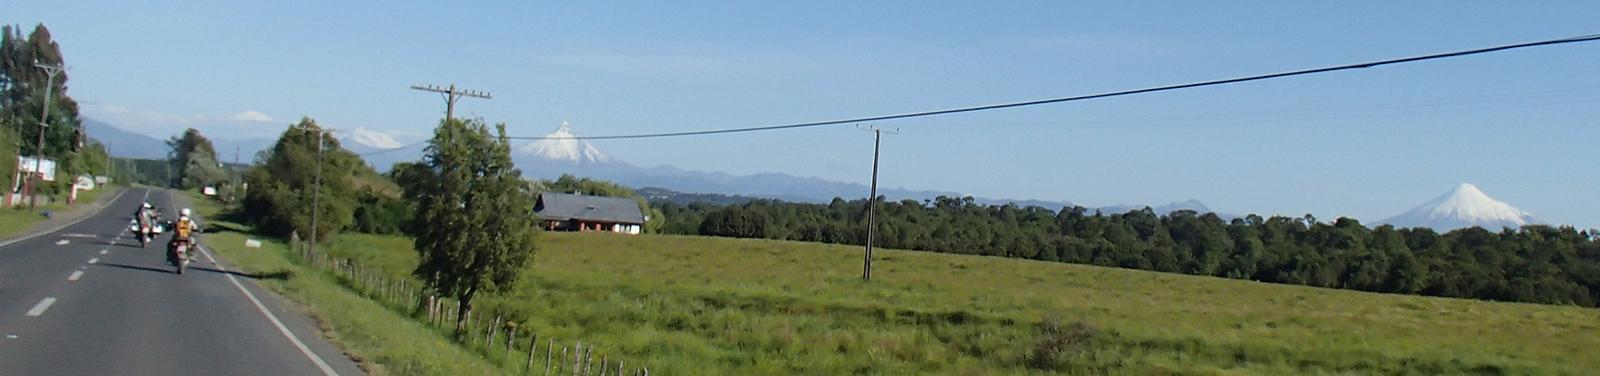 Vulkan Puntiagudo und Vulkan Osorno, Chile